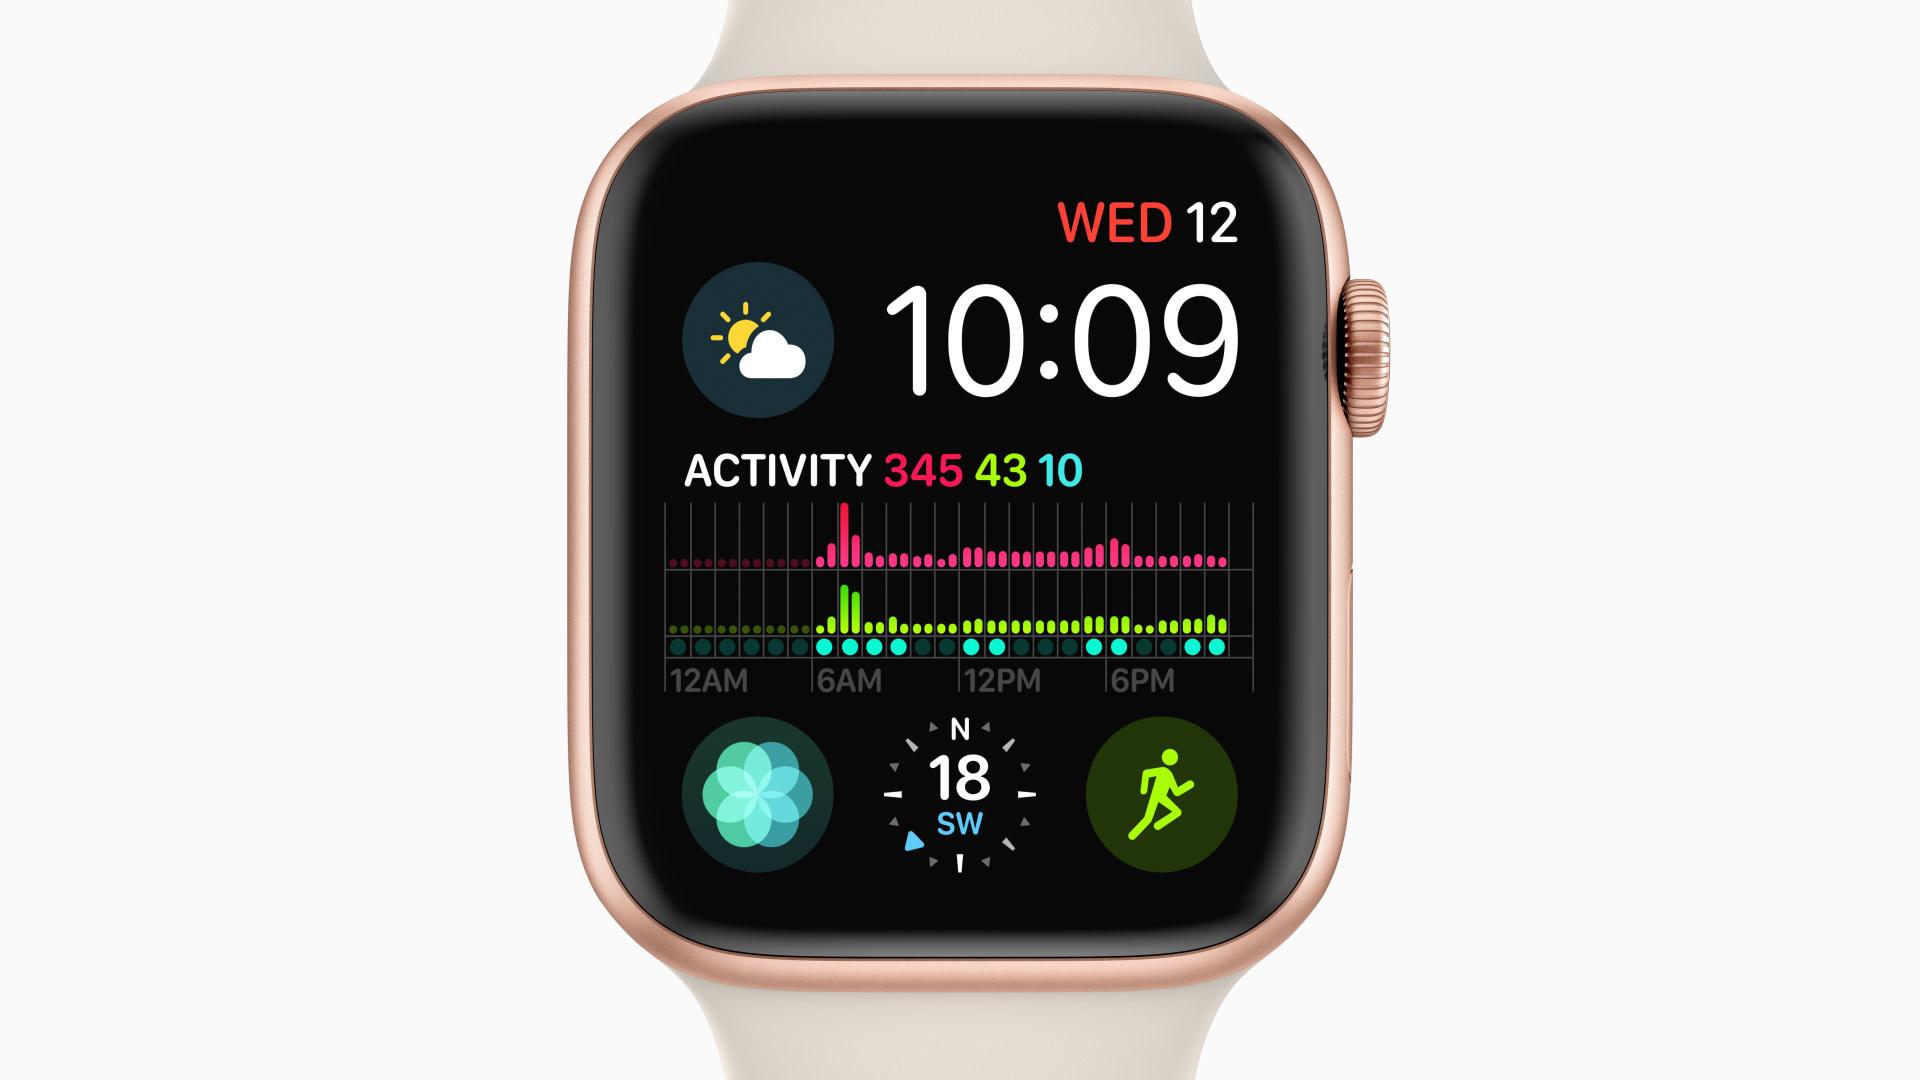 https://www.macfreak.nl/modules/news/images/zArt.AppleWatchInfographWatchFaceActivity.jpg